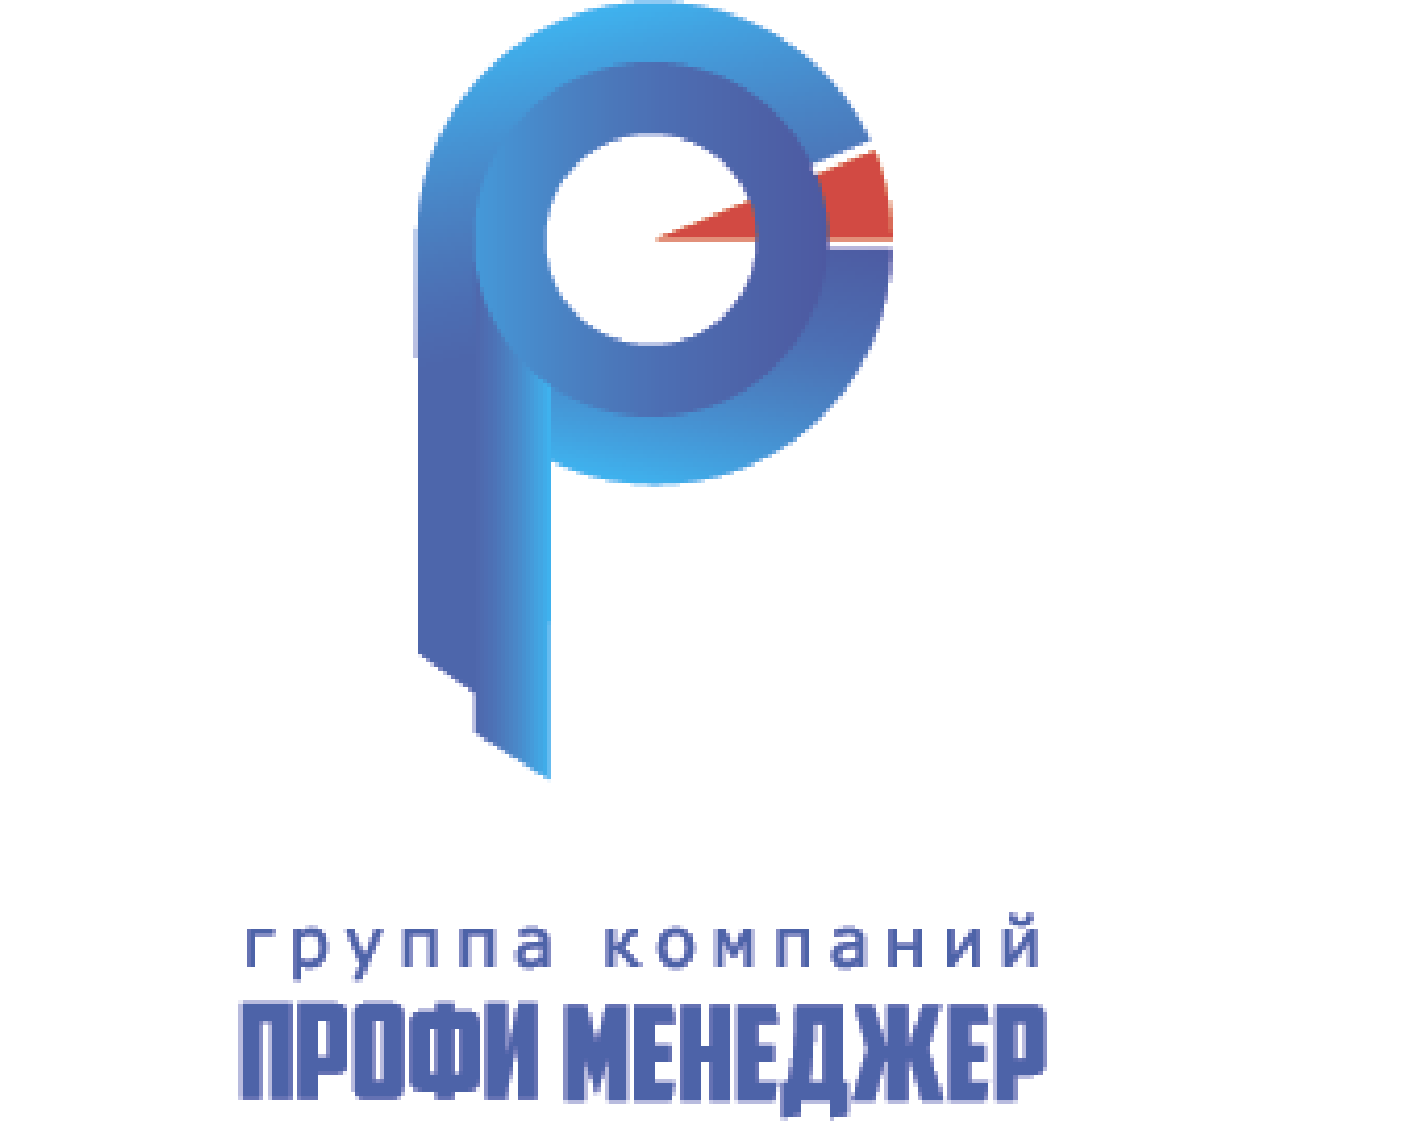 ПРОФИ Менеджер, ООО